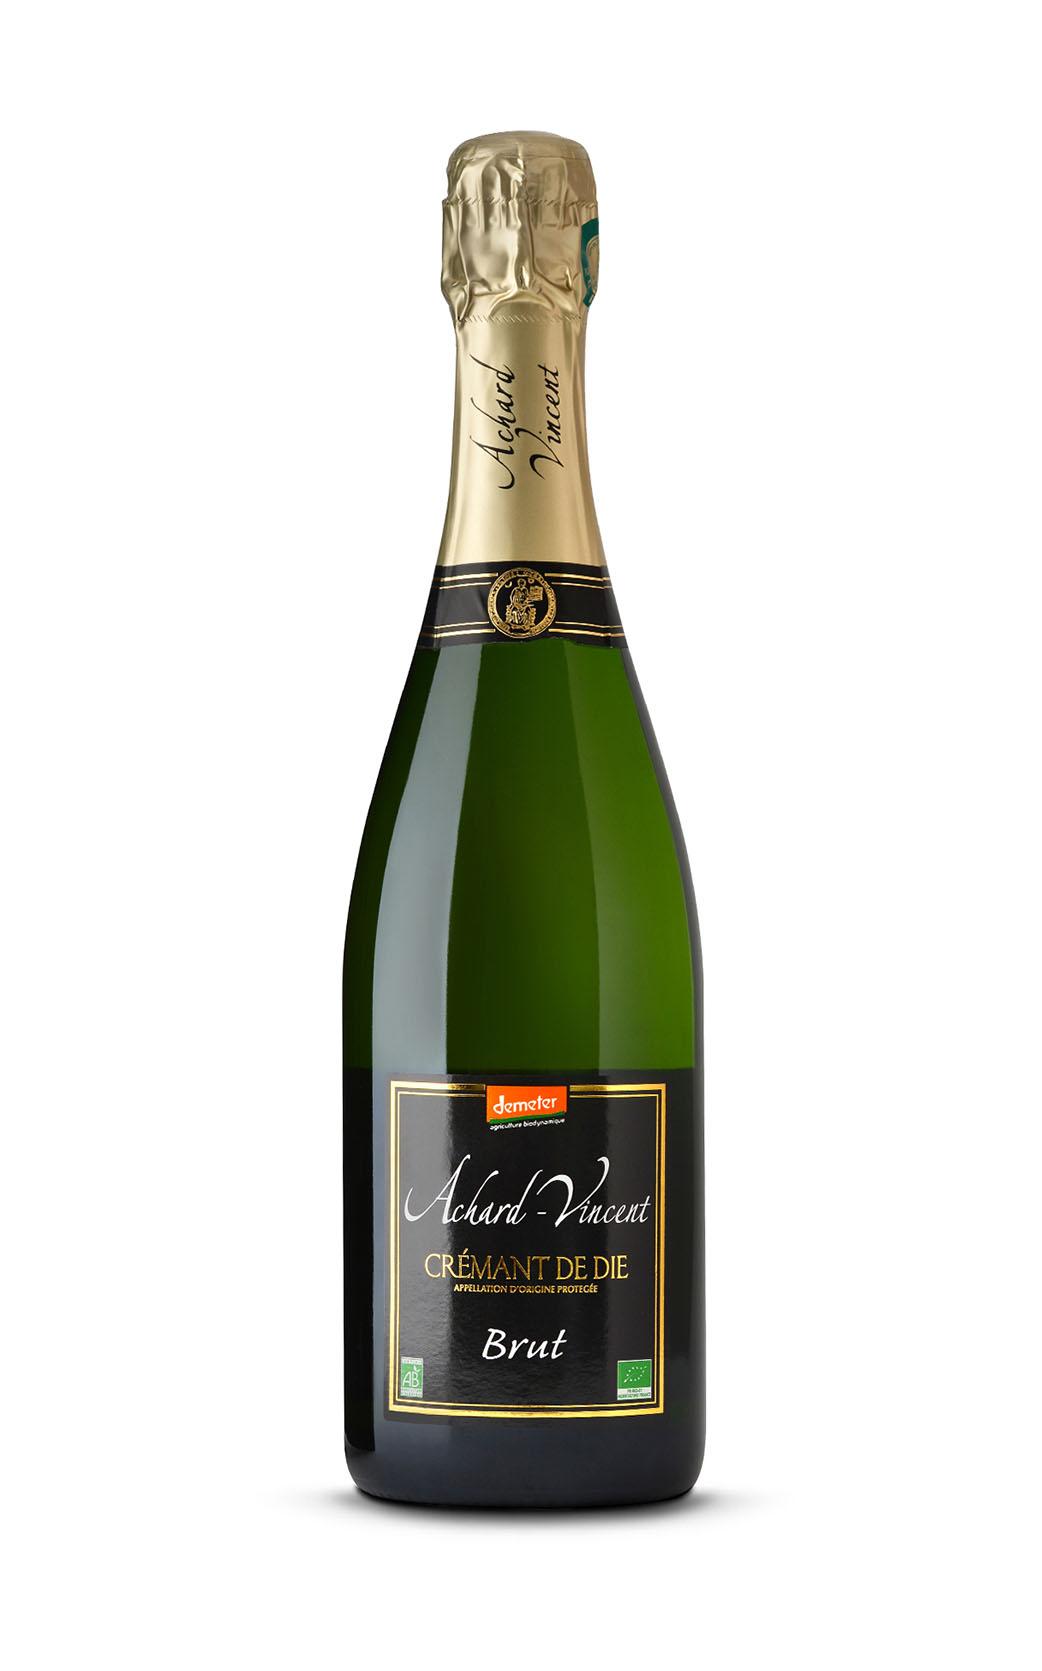 Photographe de champagne